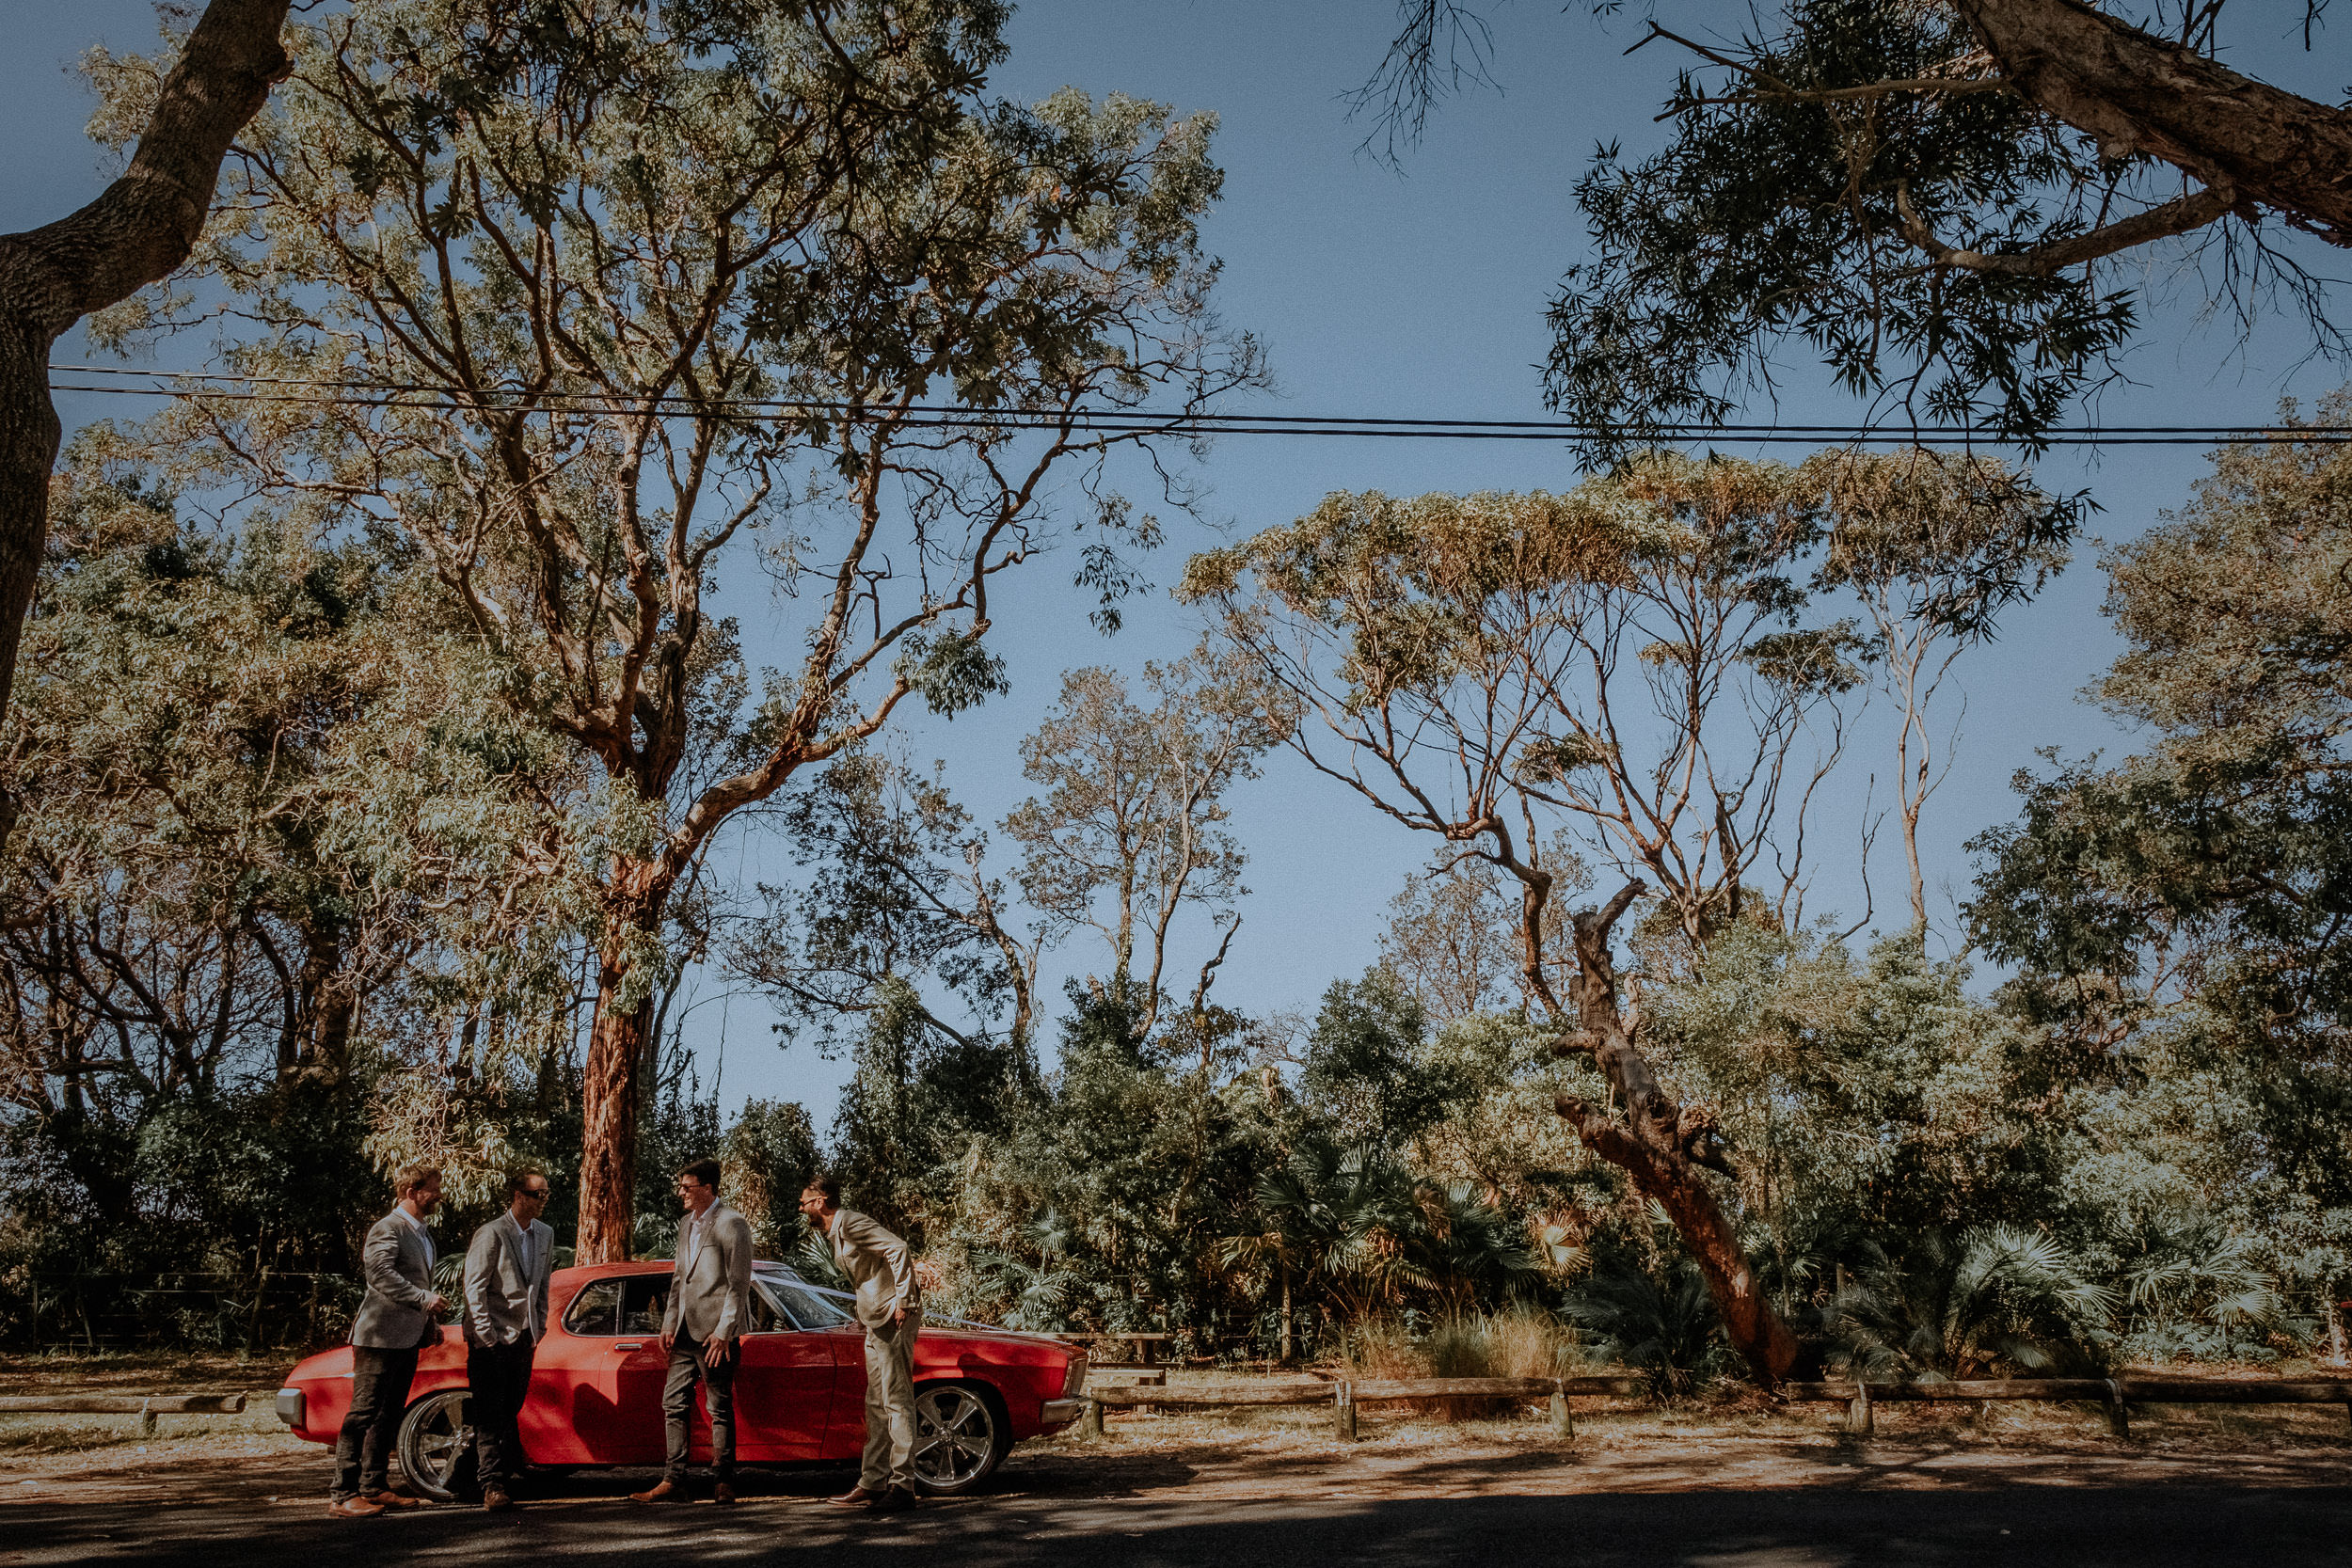 S&A Elopement - Kings & Thieves - Shred 'Til Dead - Central Coast Beach Forest Wedding - 36.jpg